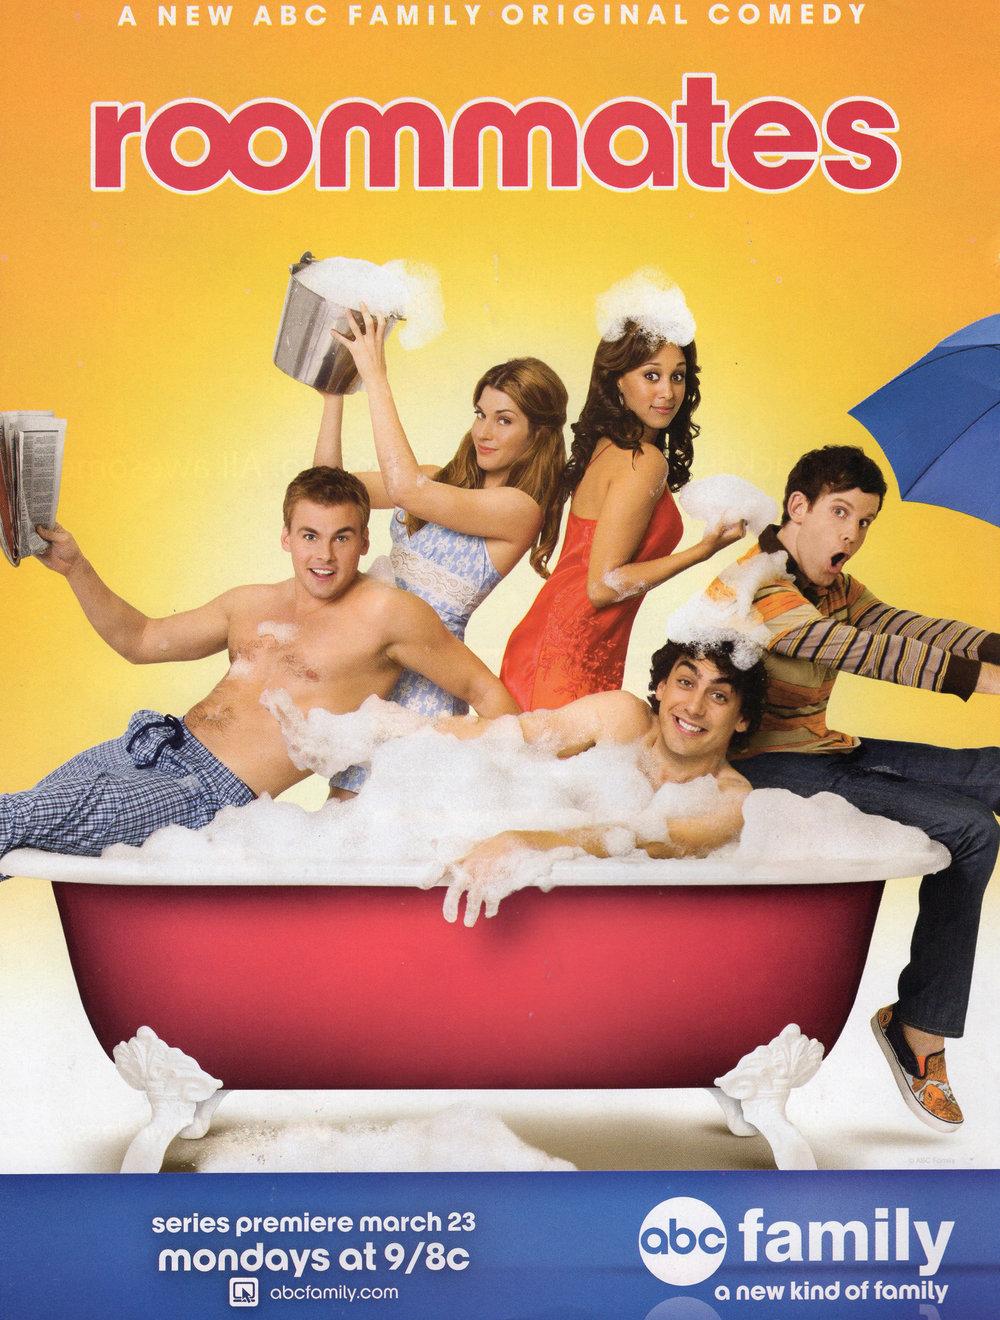 Roommates ad crop.jpg